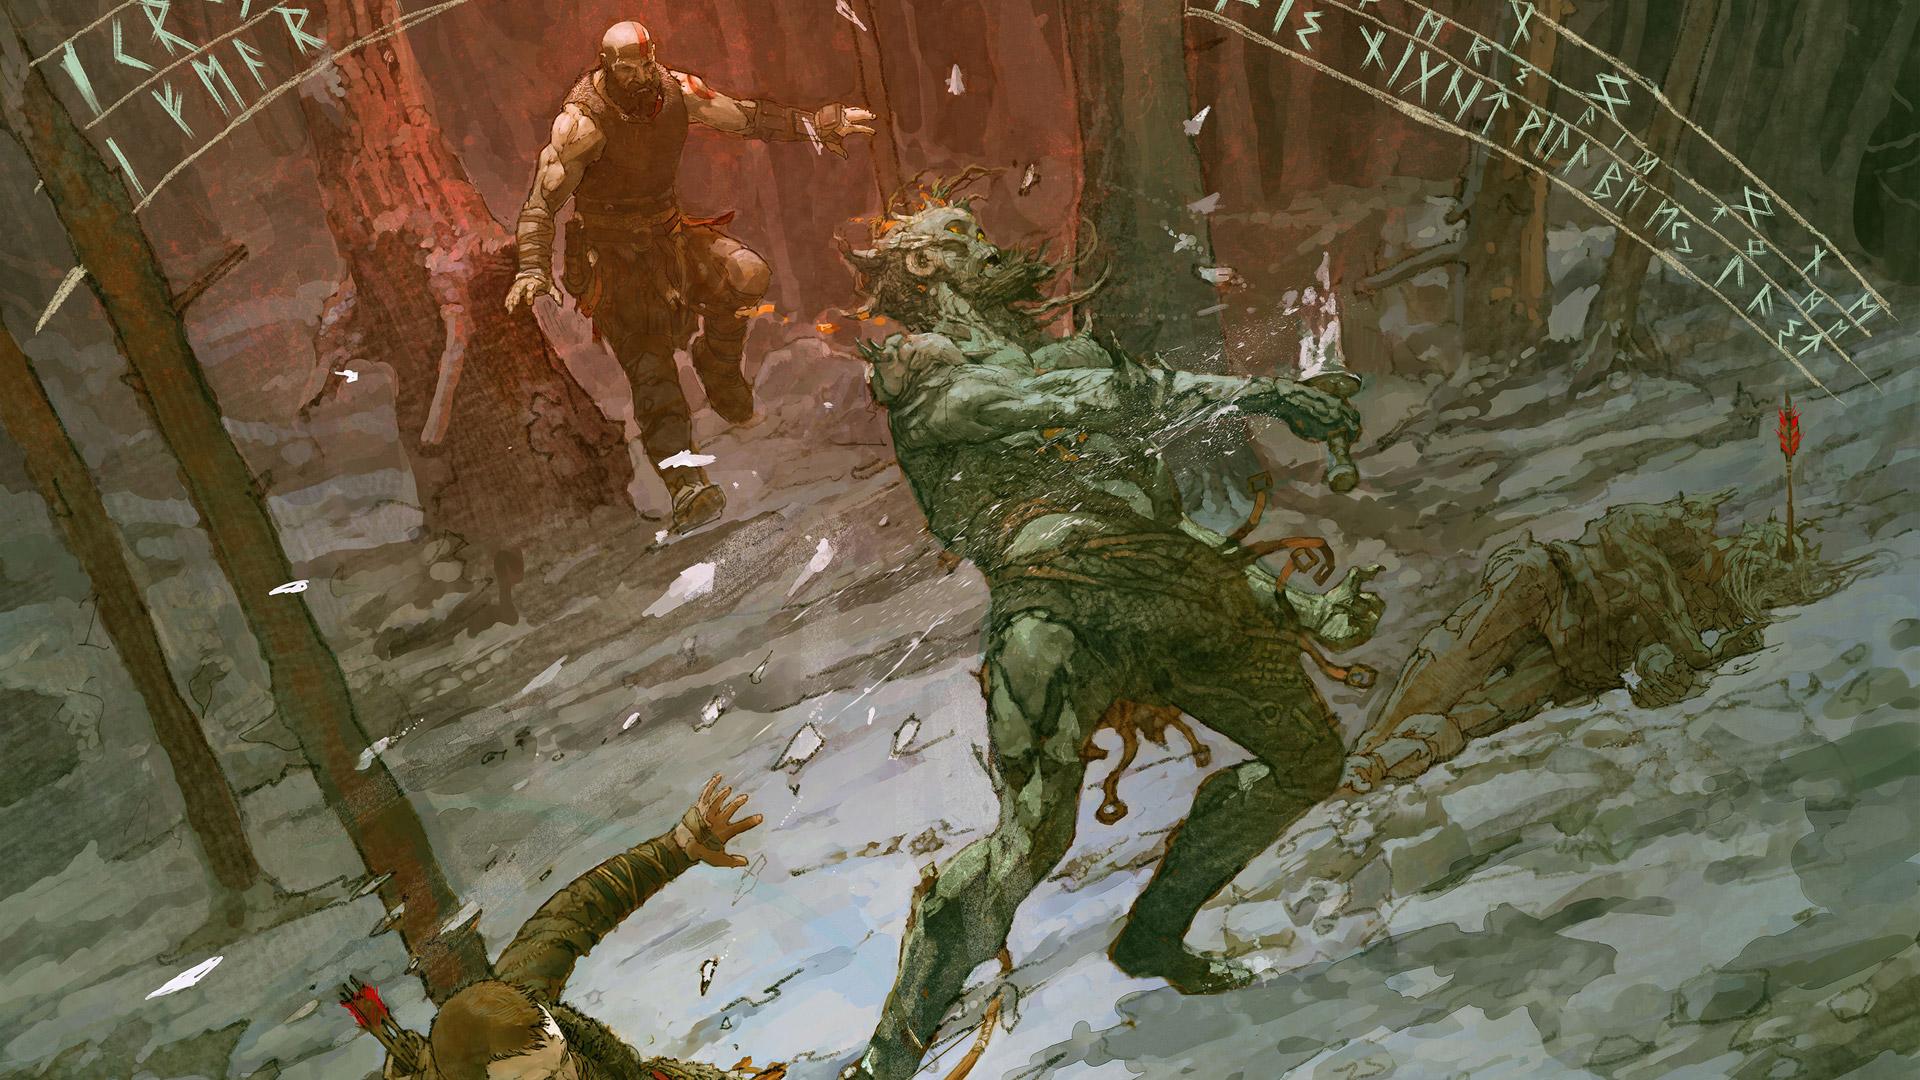 Free God of War (2018) Wallpaper in 1920x1080